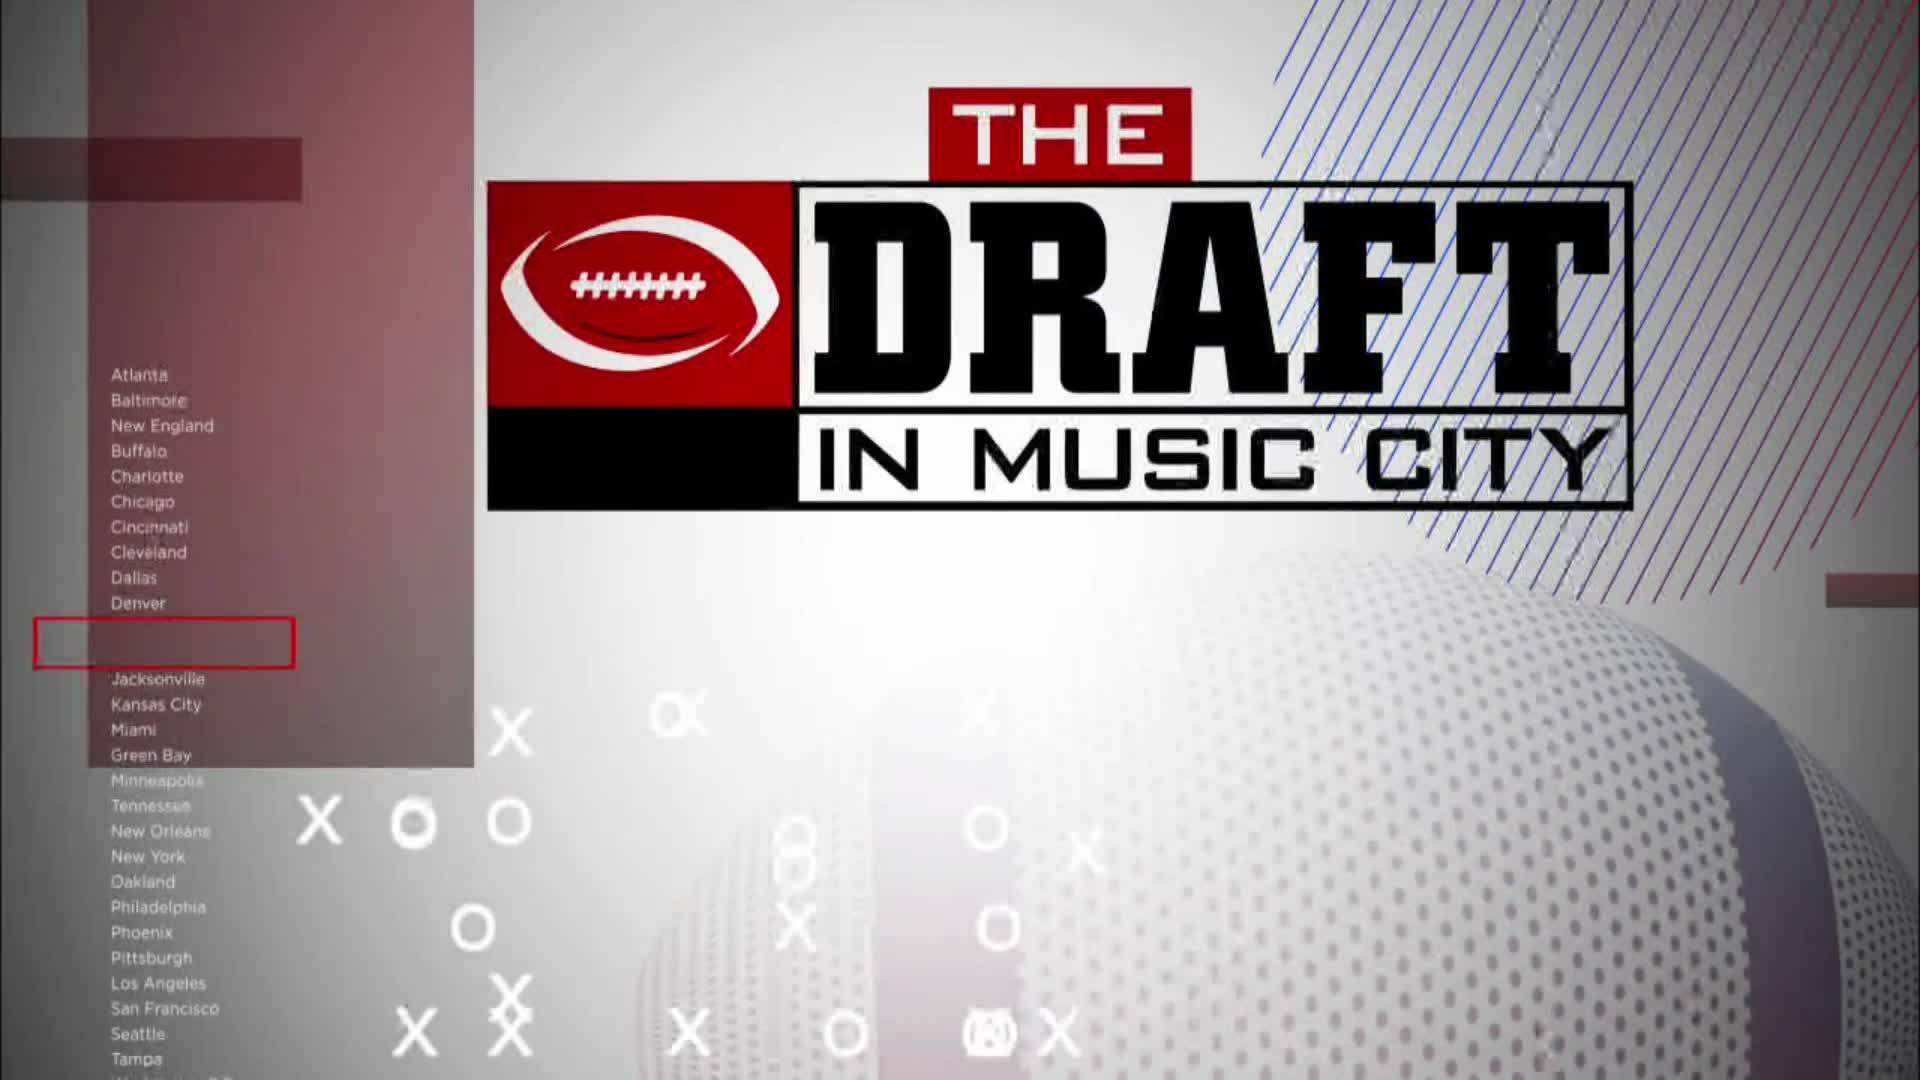 Prep_for_The_NFL_Draft_in_Music_City_beg_2_20190329221401